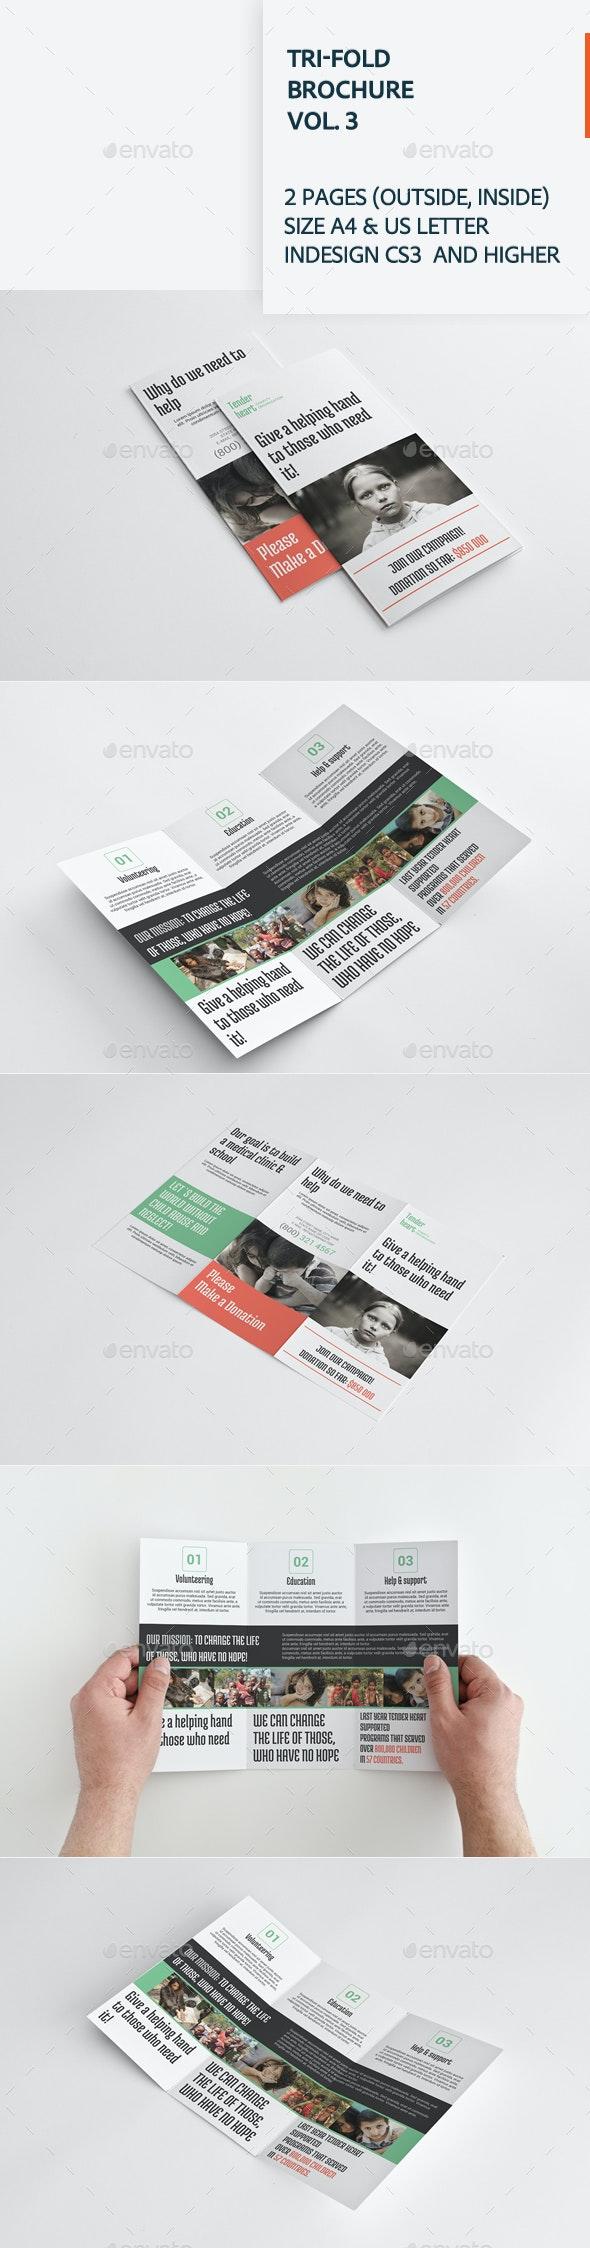 Tri-fold Brochure Vol. 3 - Corporate Brochures